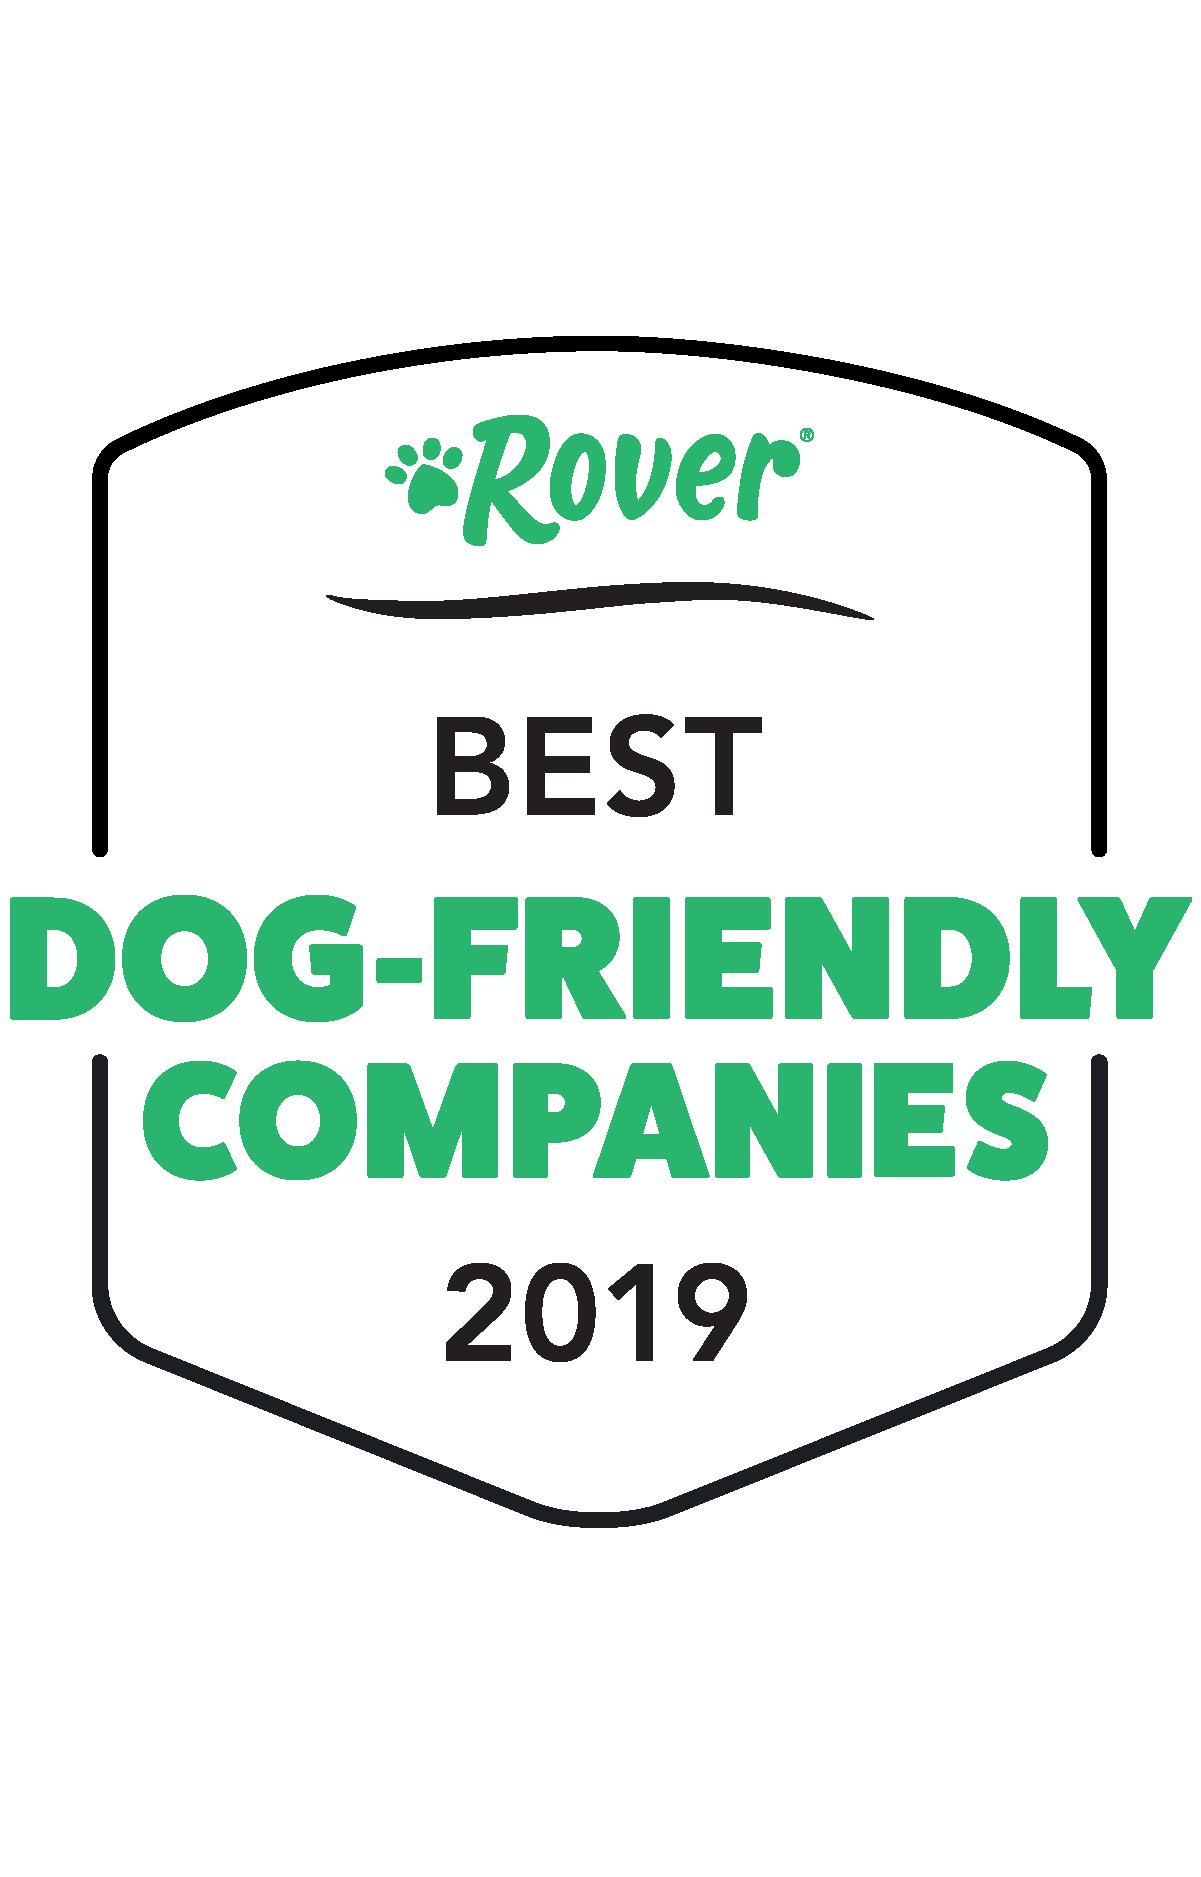 Best Dog Friendly Companies 2019